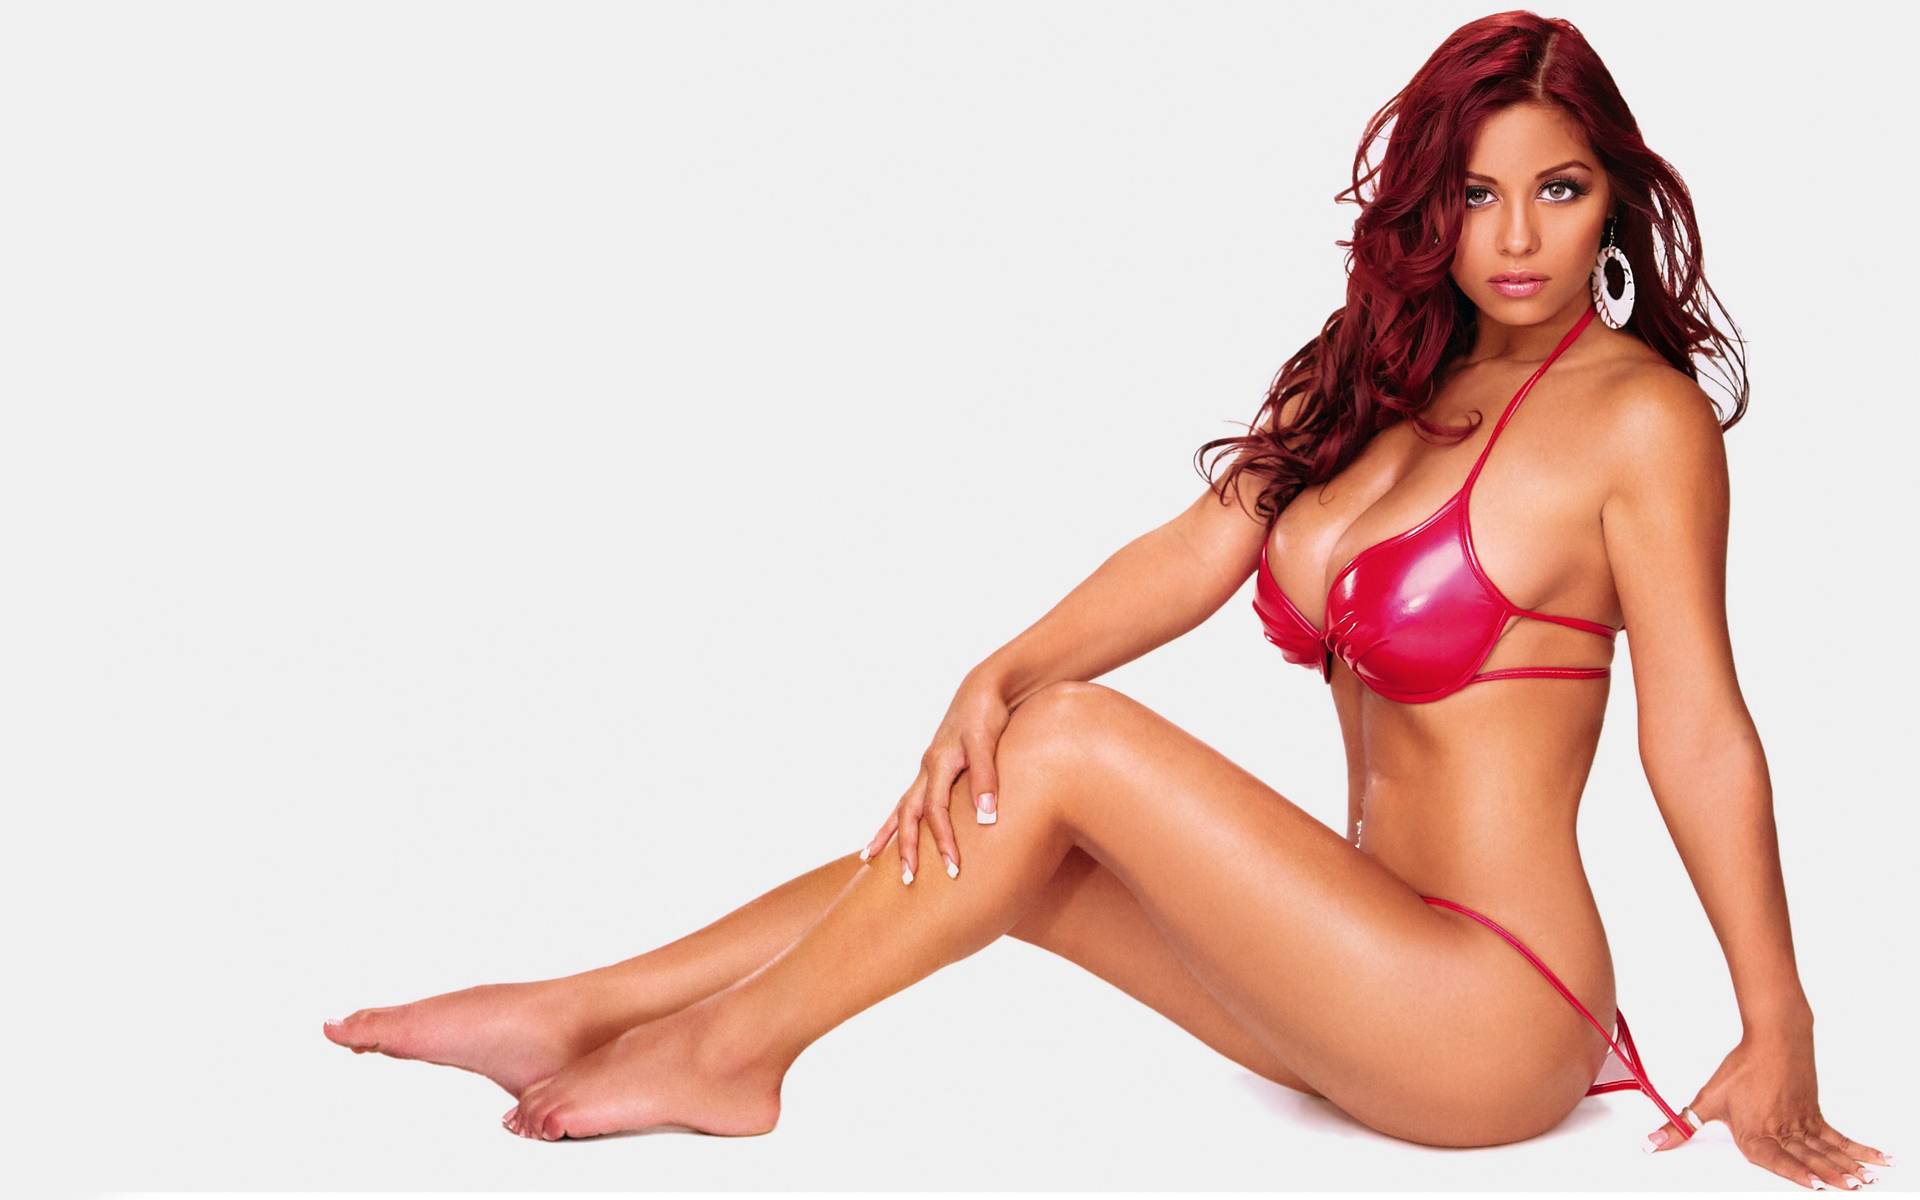 Brenda lynn acevedo nude — pic 3